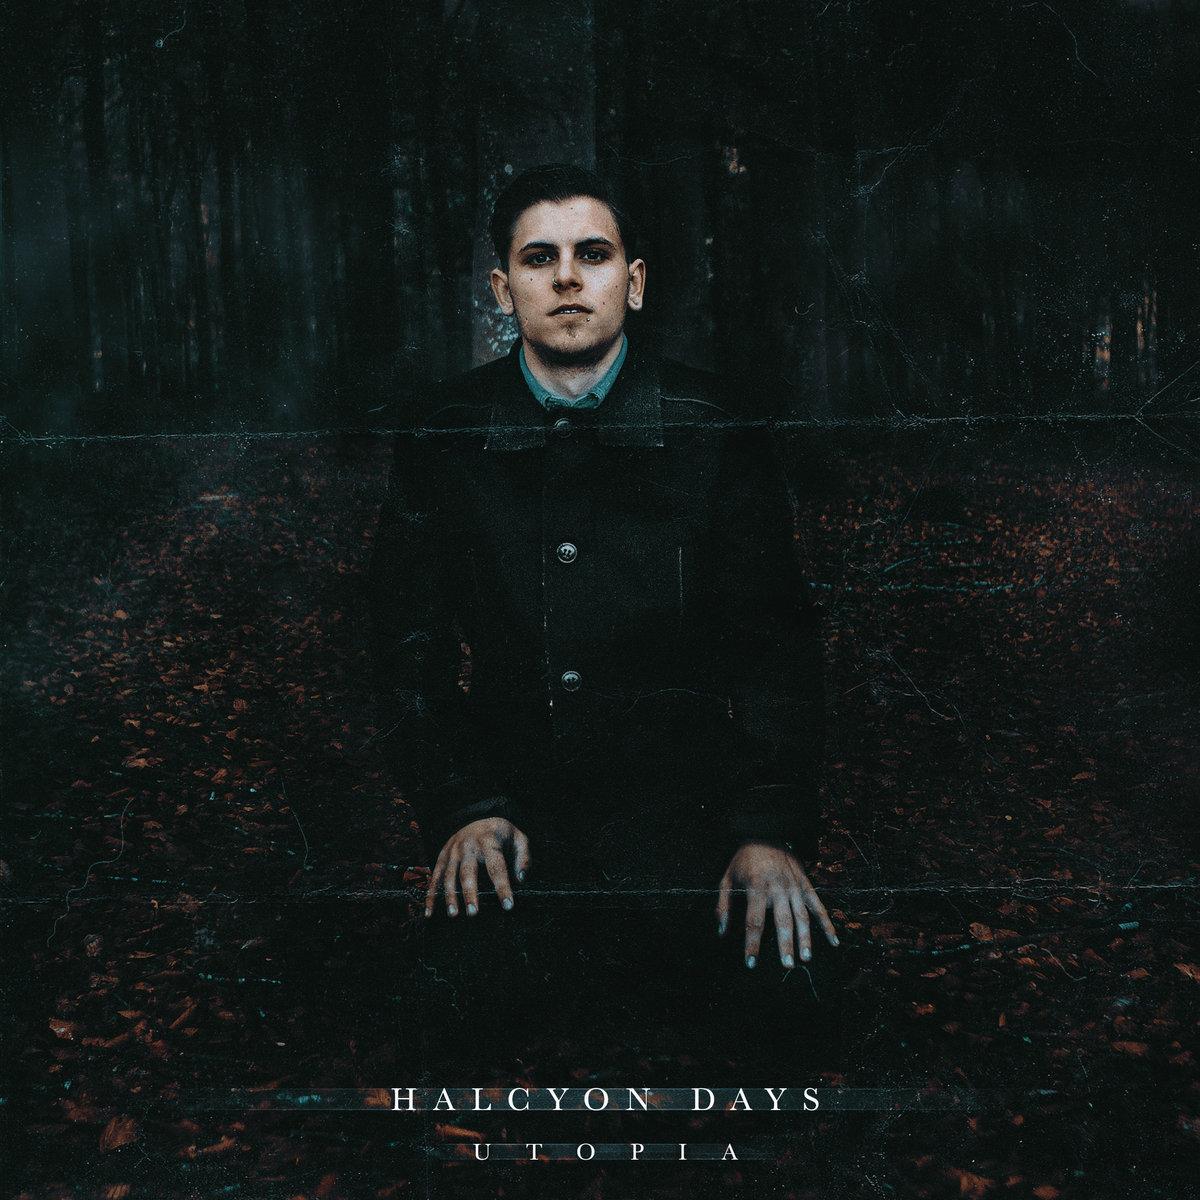 Halcyon Days - Utopia [single] (2016)